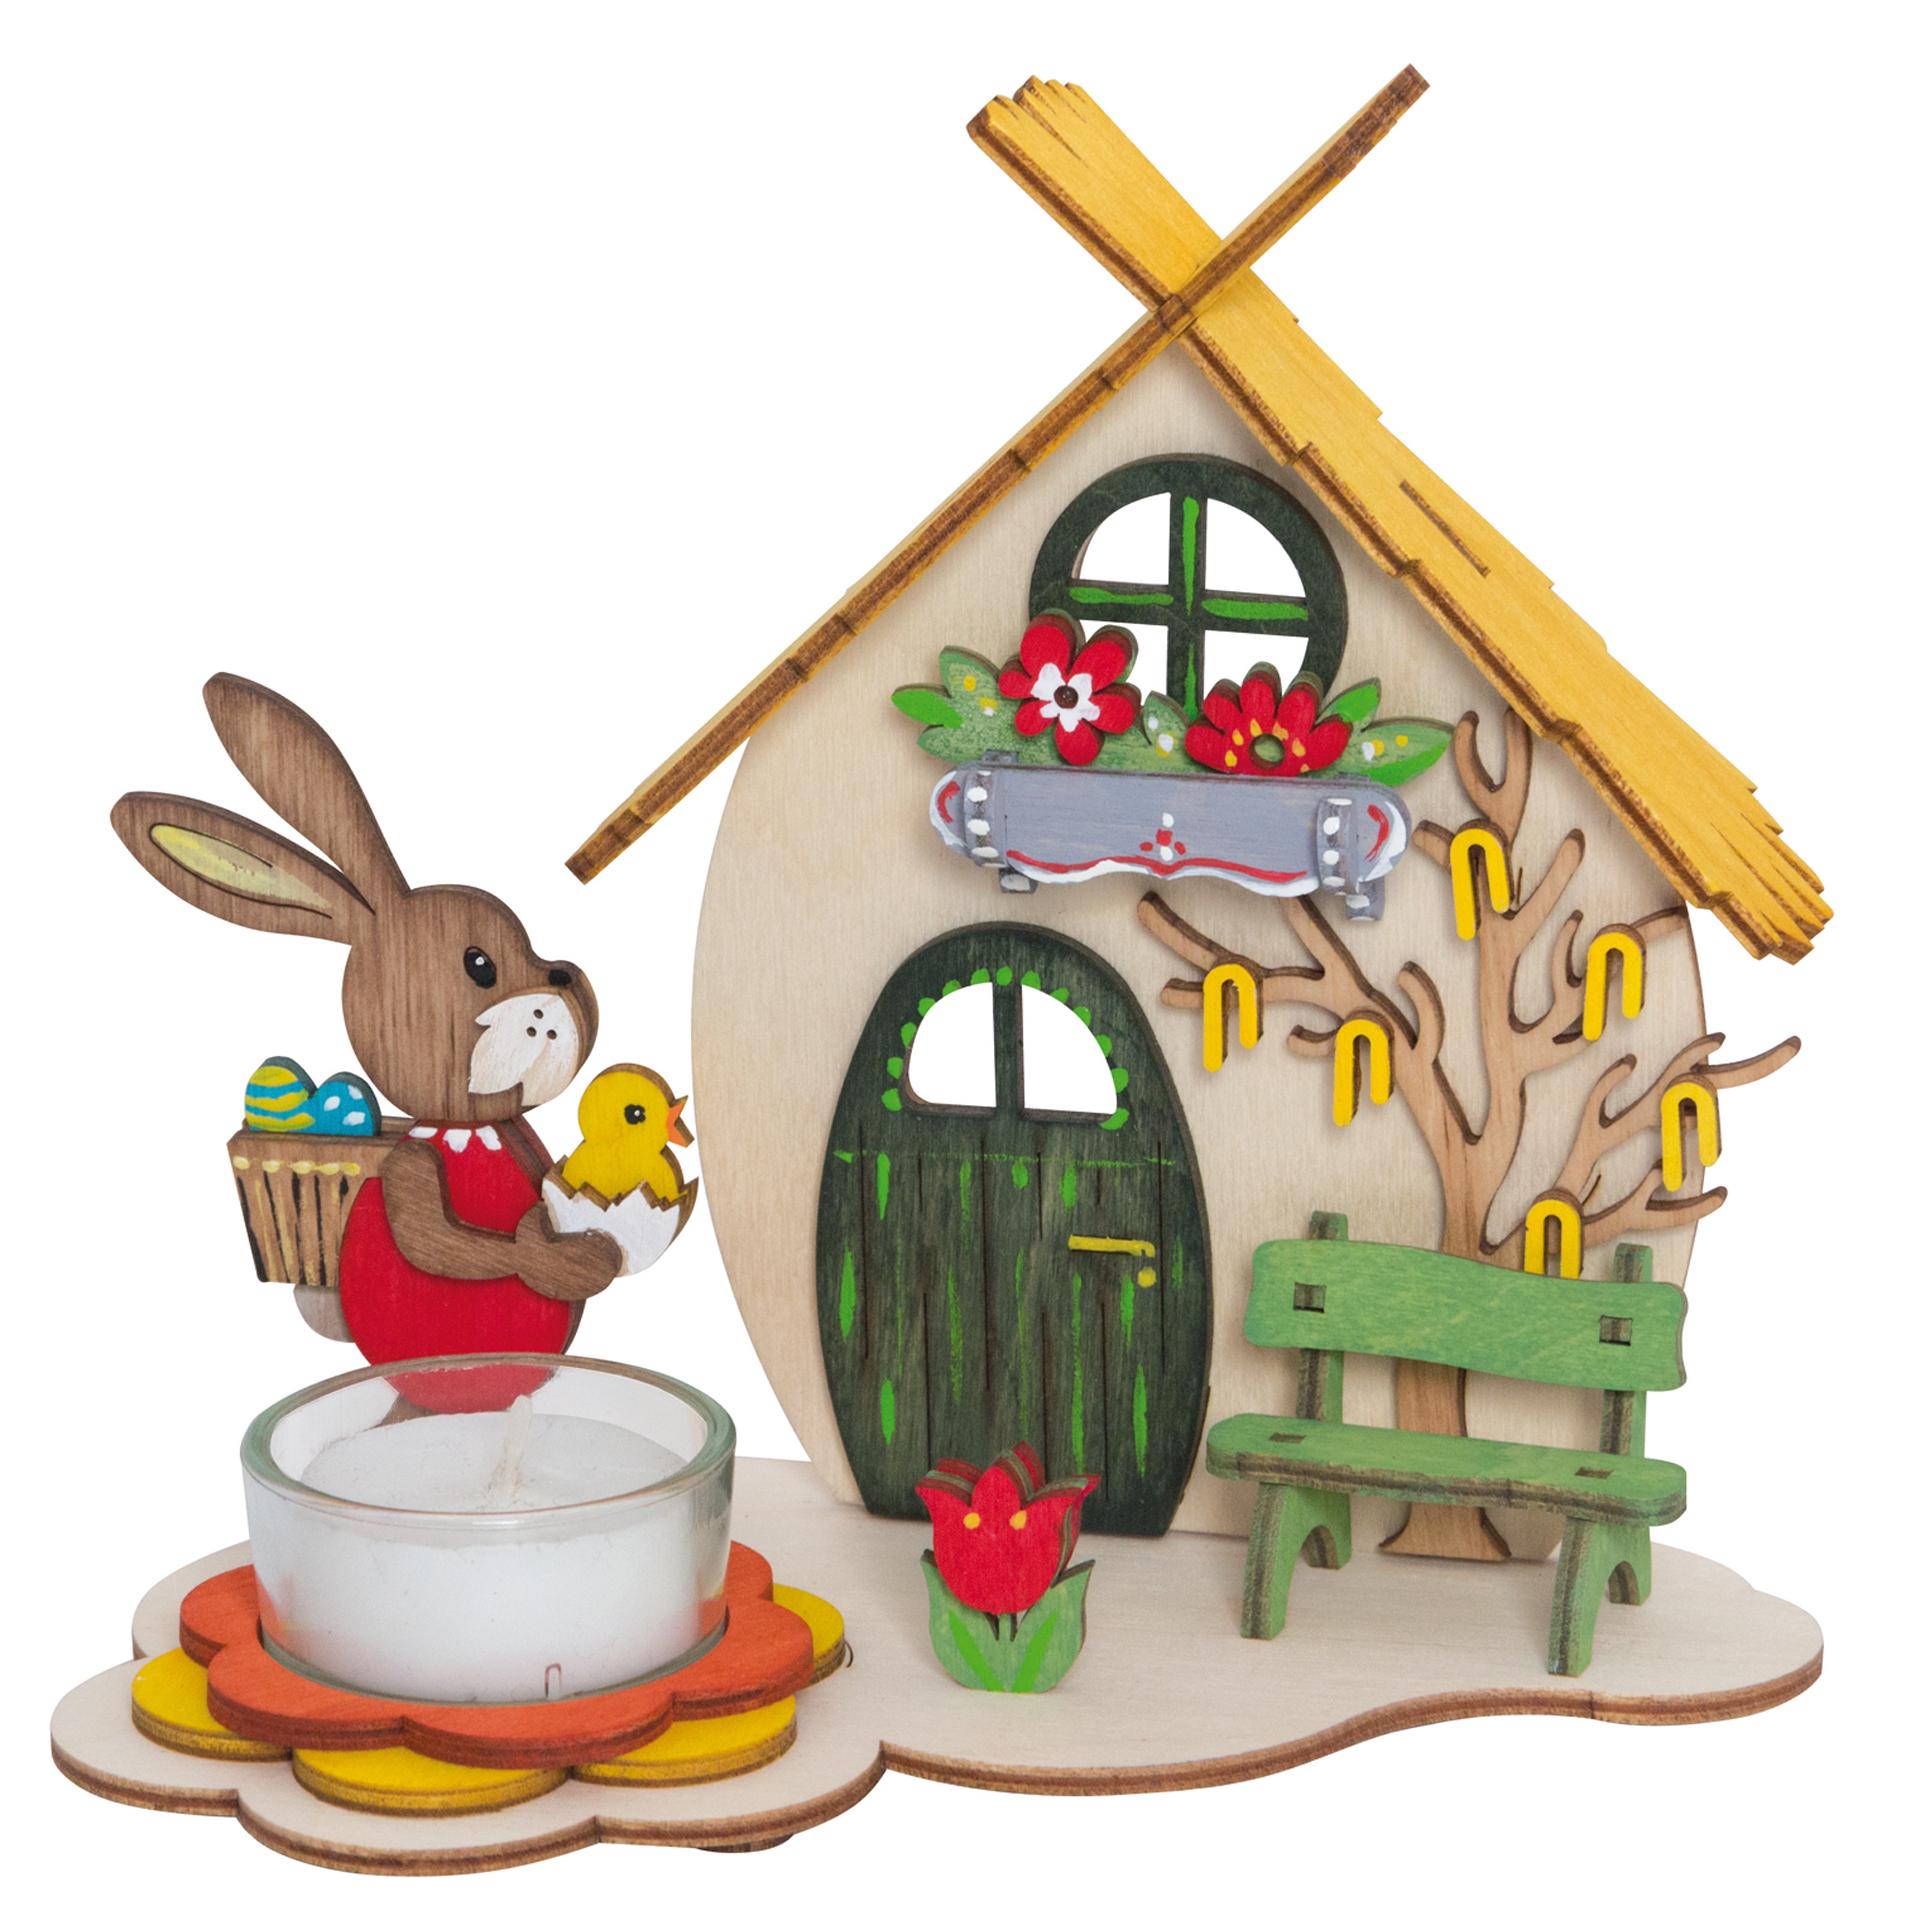 Bastelset Teelichthalter Osterhaus